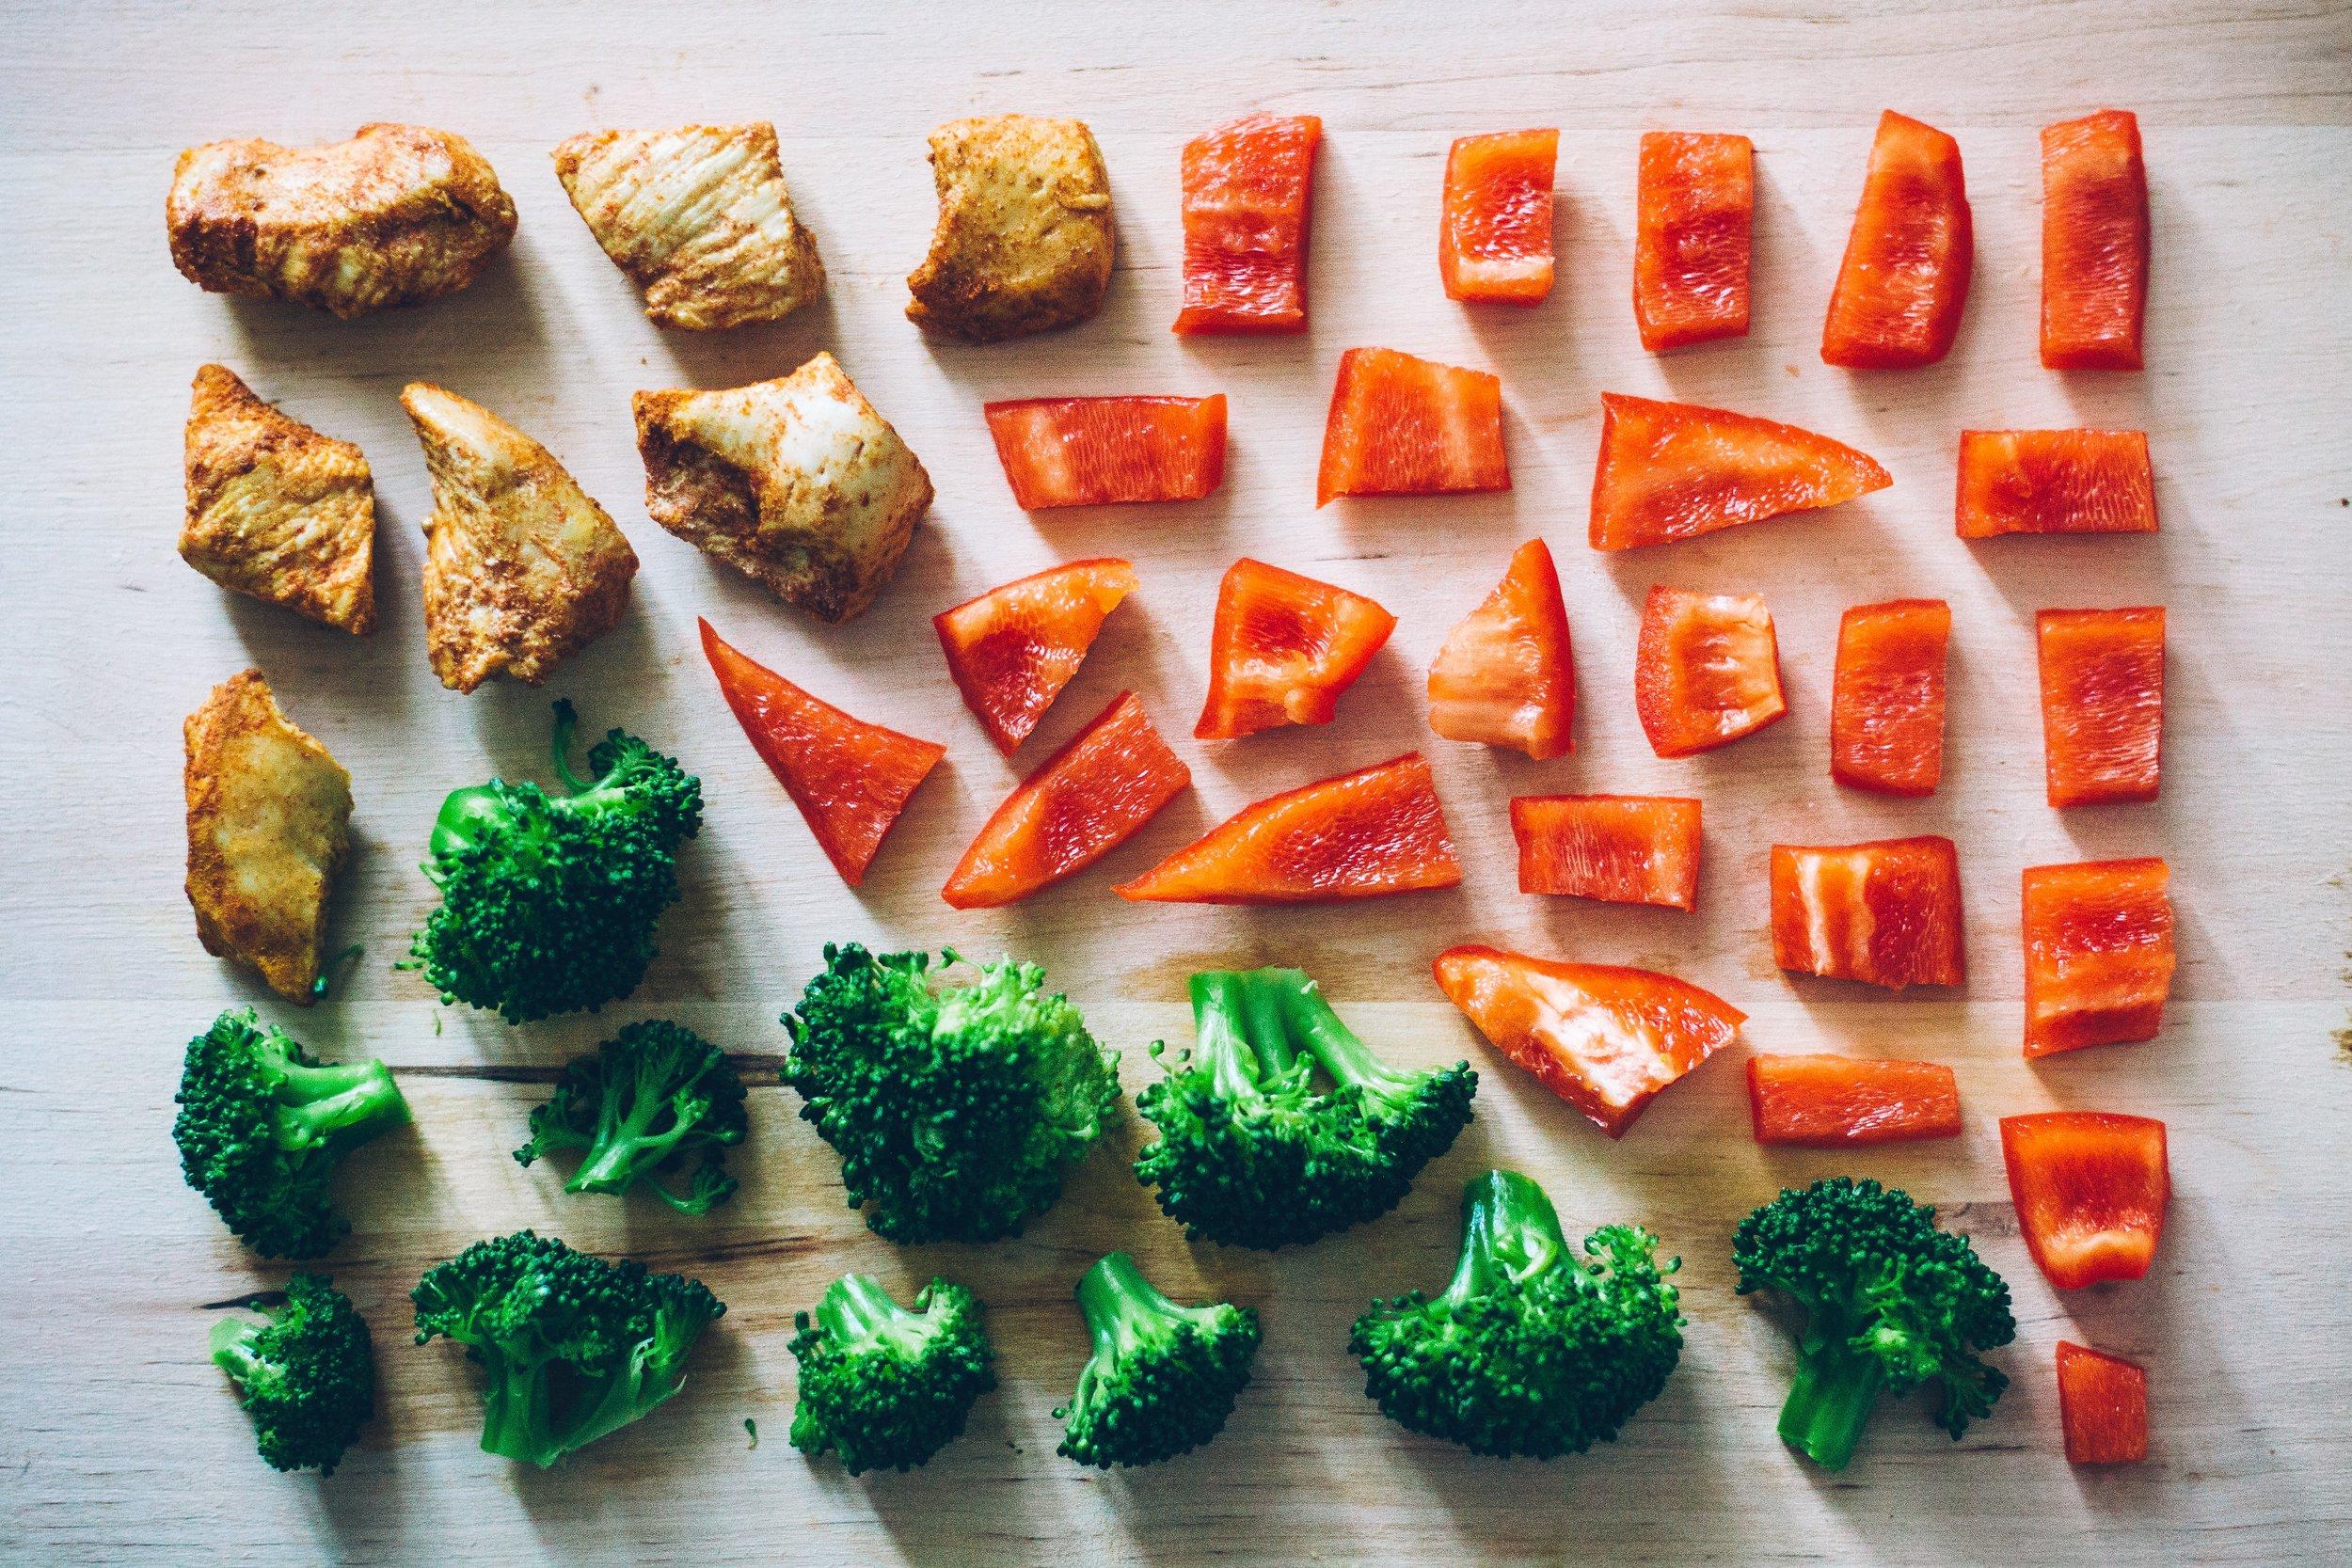 broccoli-dinner-healthy-8844.jpg